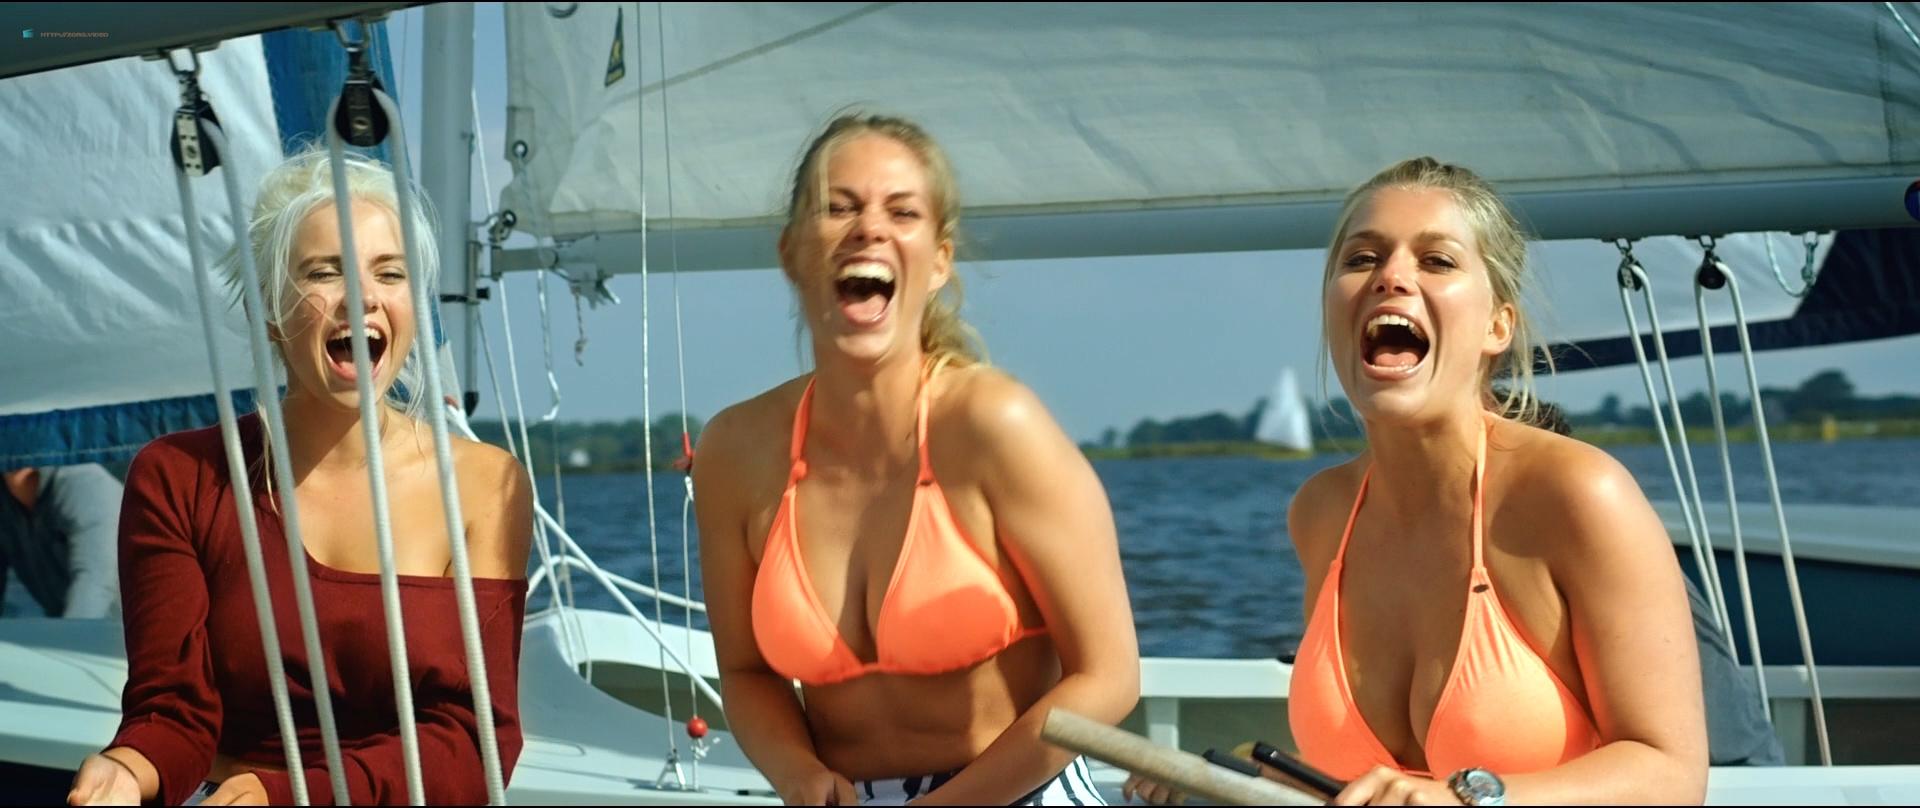 Holly Mae Brood hot and sexy Carolien Spoor, Marly van der Velden nude sex - Sneekweek (NL-2016) HD 1080p BluRay (18)